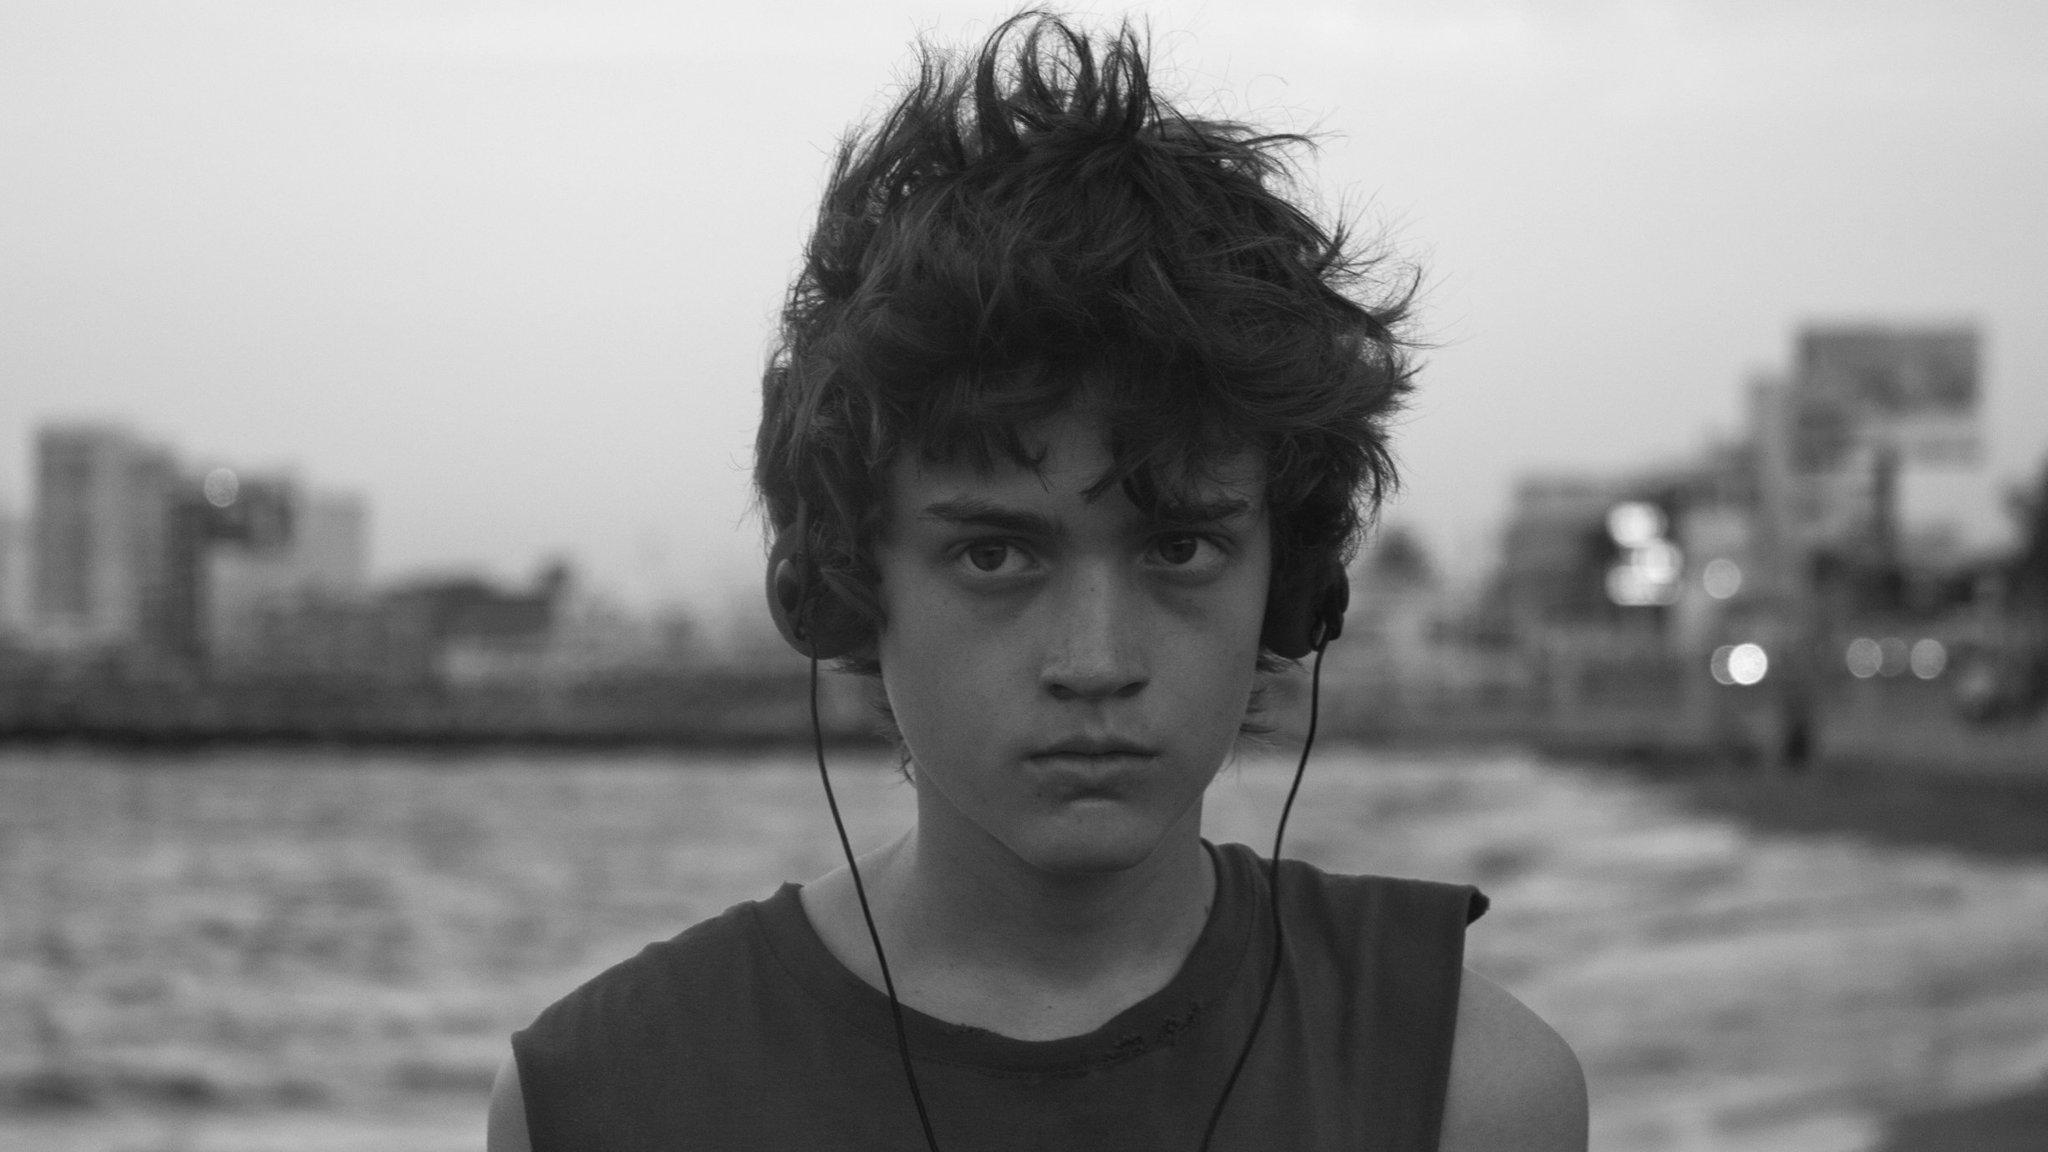 Güeros — film review: 'Verve and imagination' | Financial Times